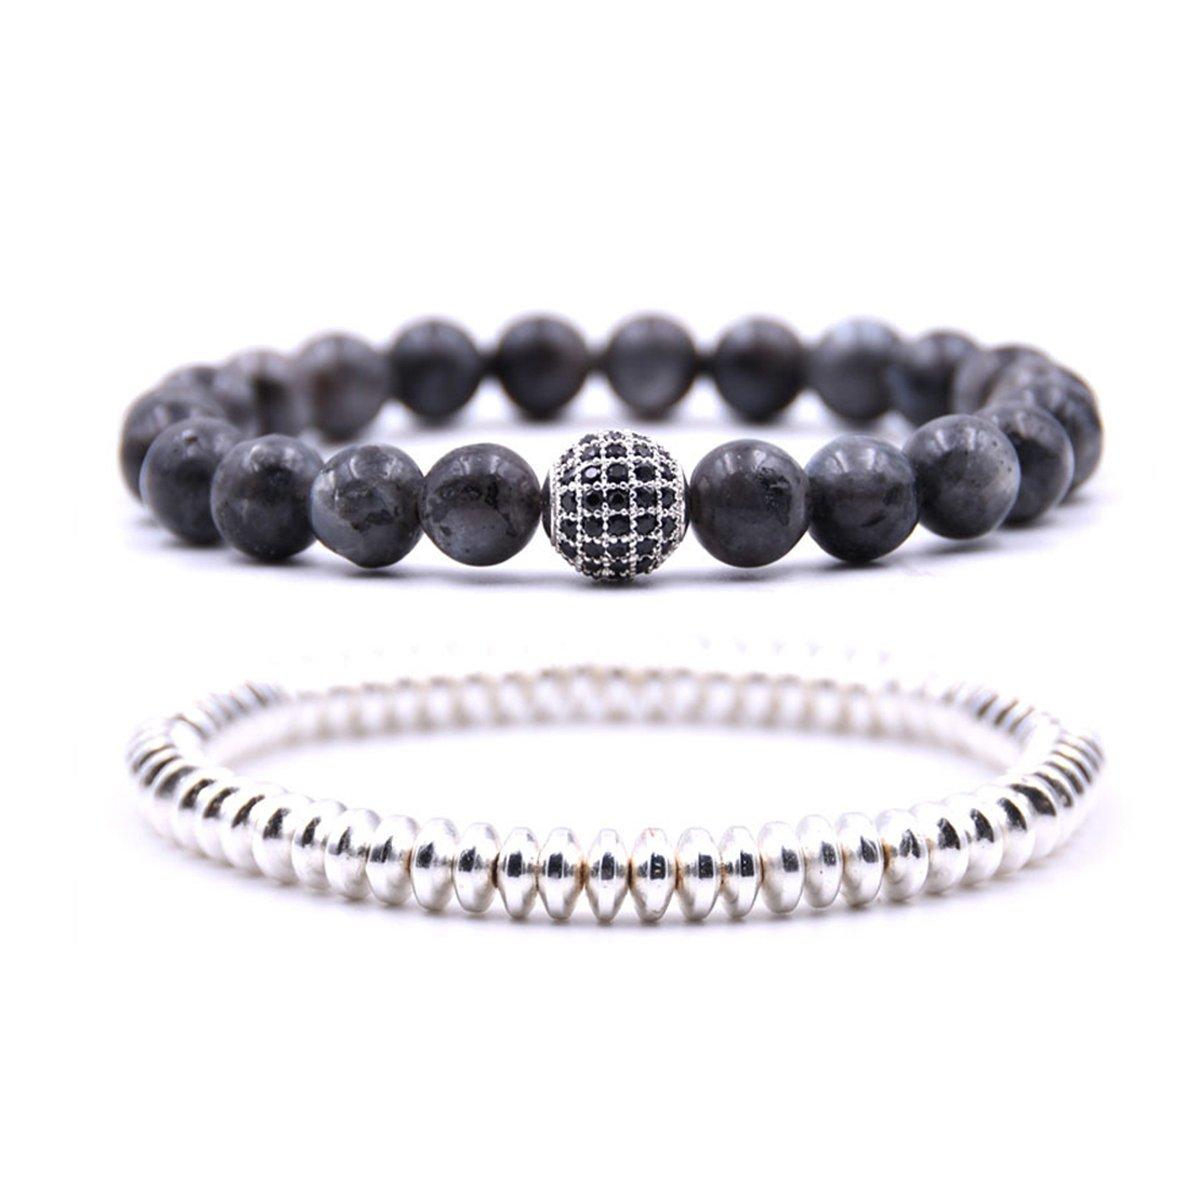 Zhepin Silver Men Women Bracelet Set Beads Bracelet Set for Men Handmade Jewelry Power Crystal Stretch Bracelets